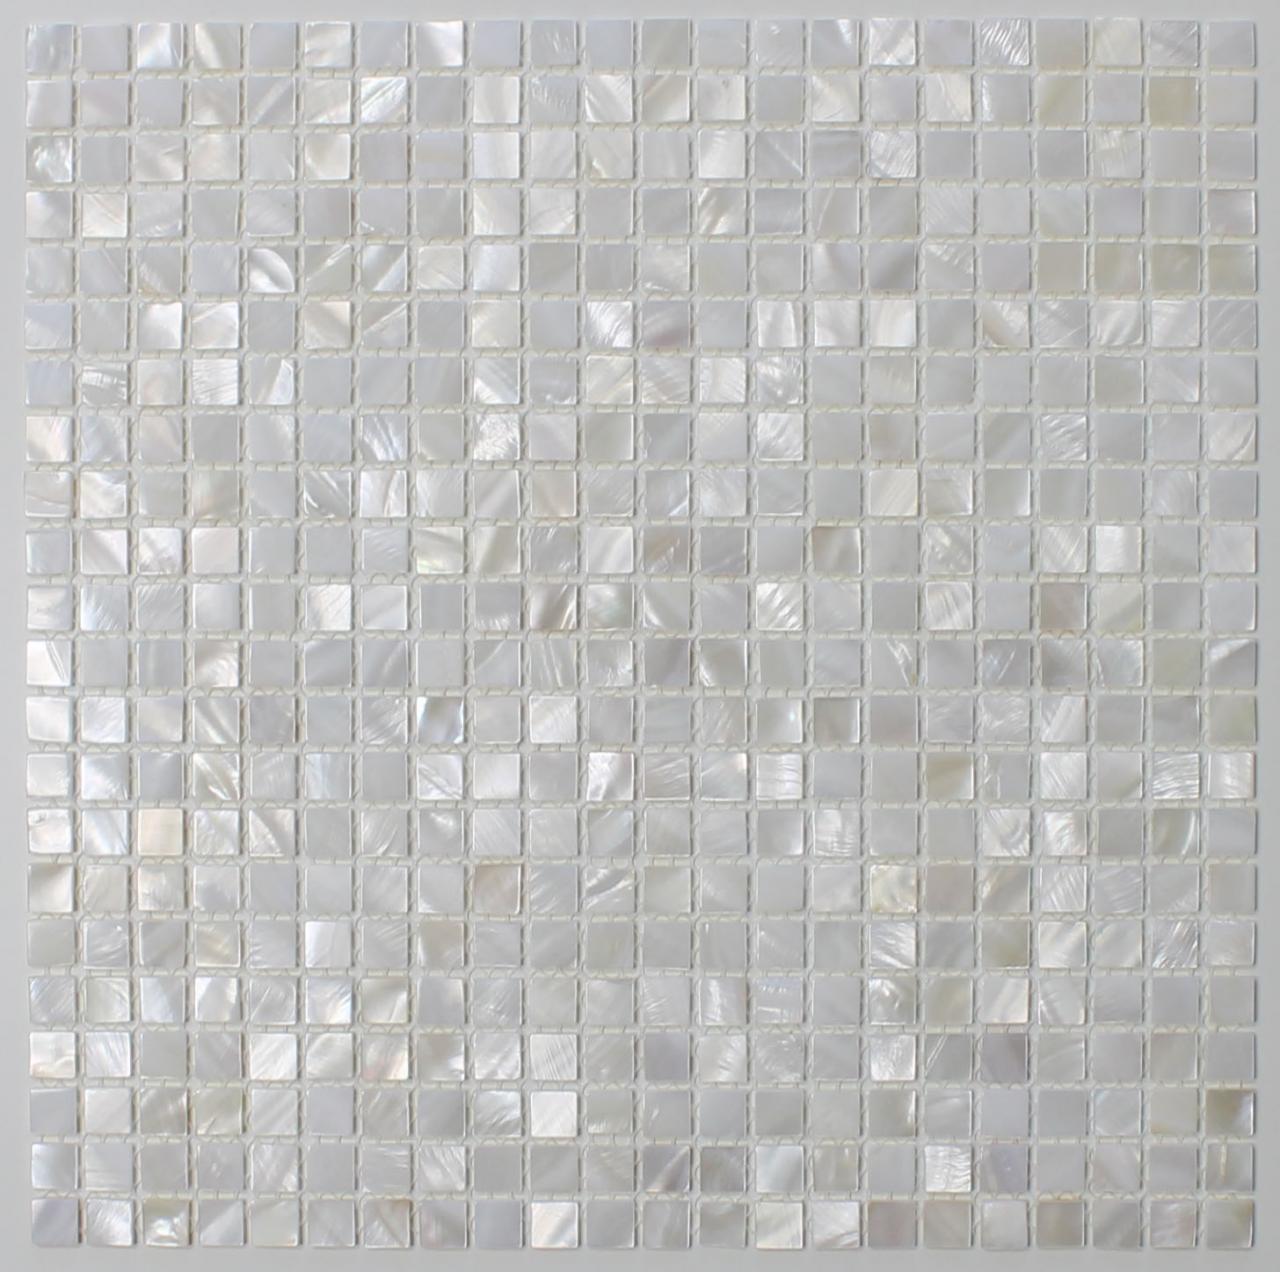 Mother of Pearl Oyster White Subway Mosaic Tiles Kitchen Backsplash